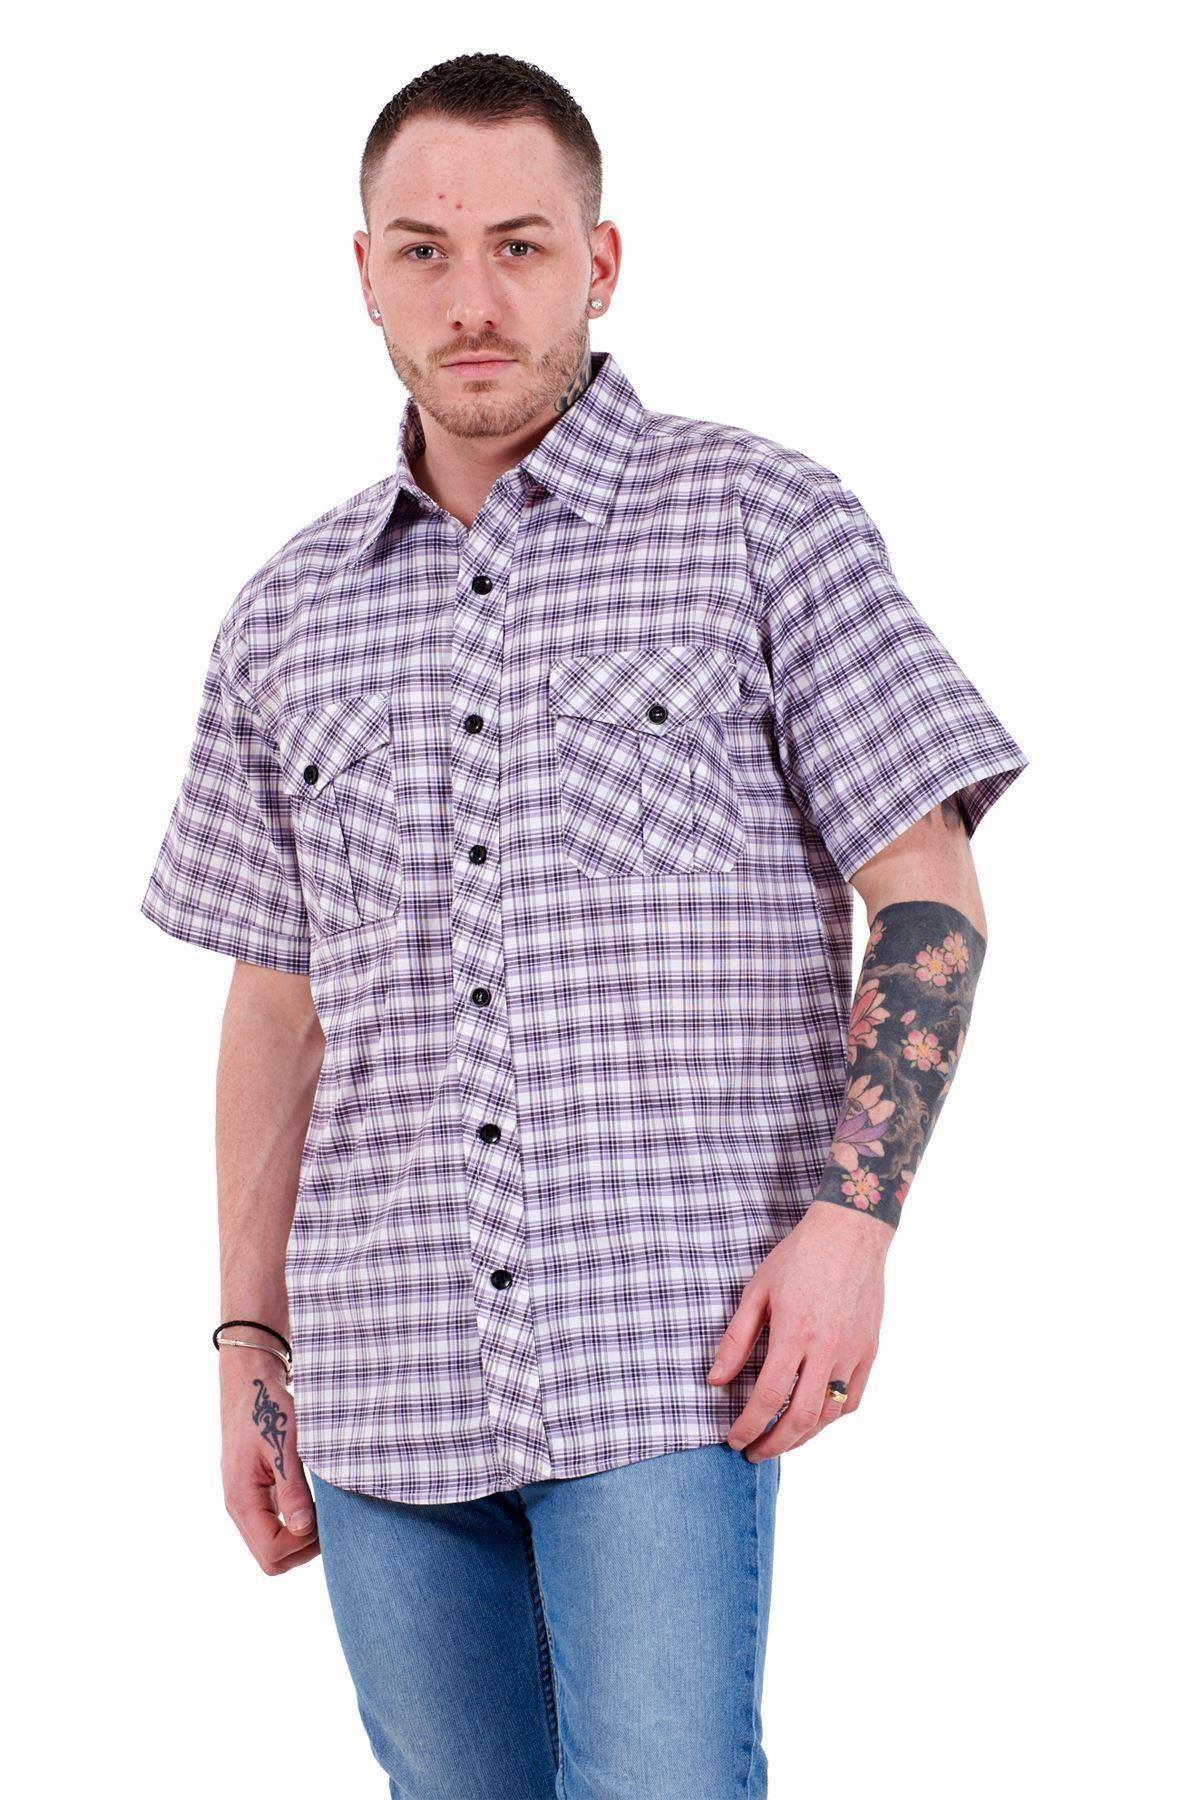 Mens-Regular-Big-Size-Shirts-Checked-Cotton-Blend-Casual-Short-Sleeve-M-to-5XL thumbnail 24